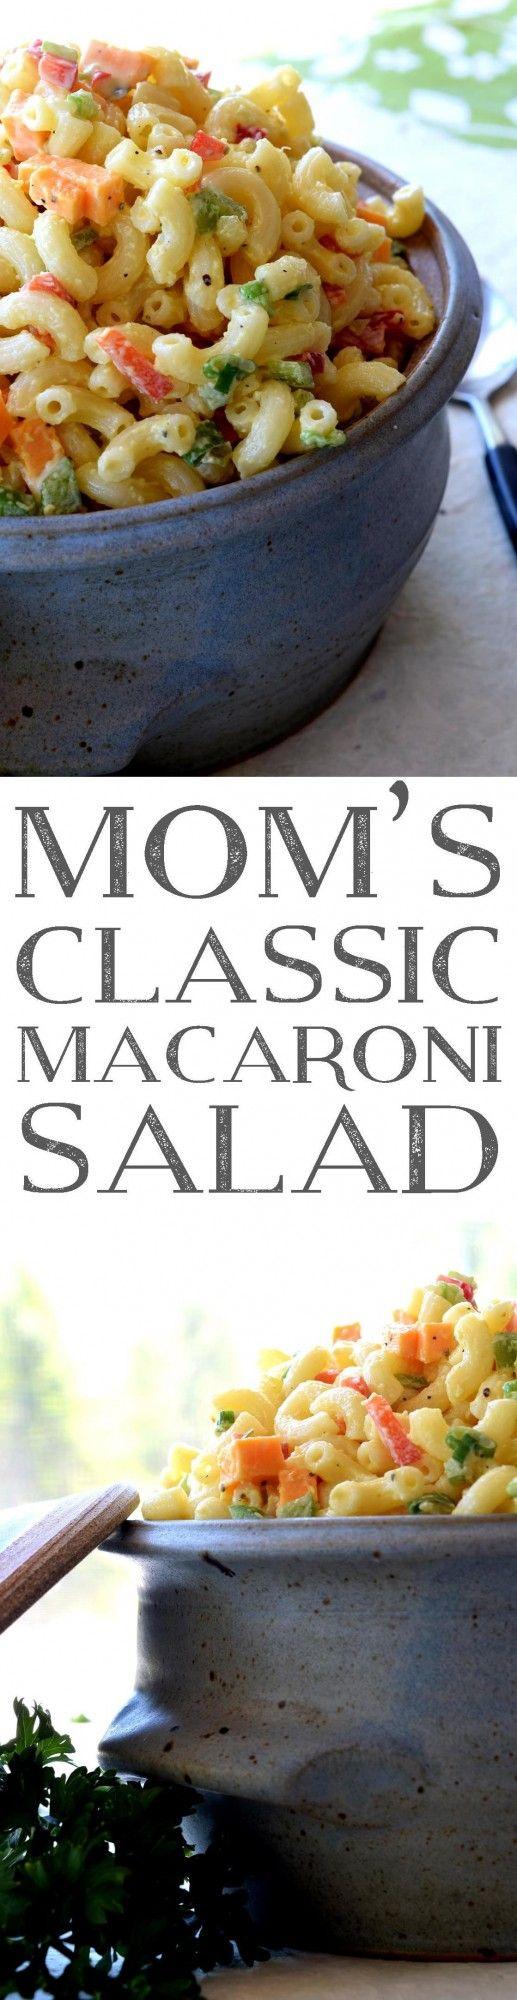 Mom's Classic Macaroni Salad - Lord Byron's Kitchen